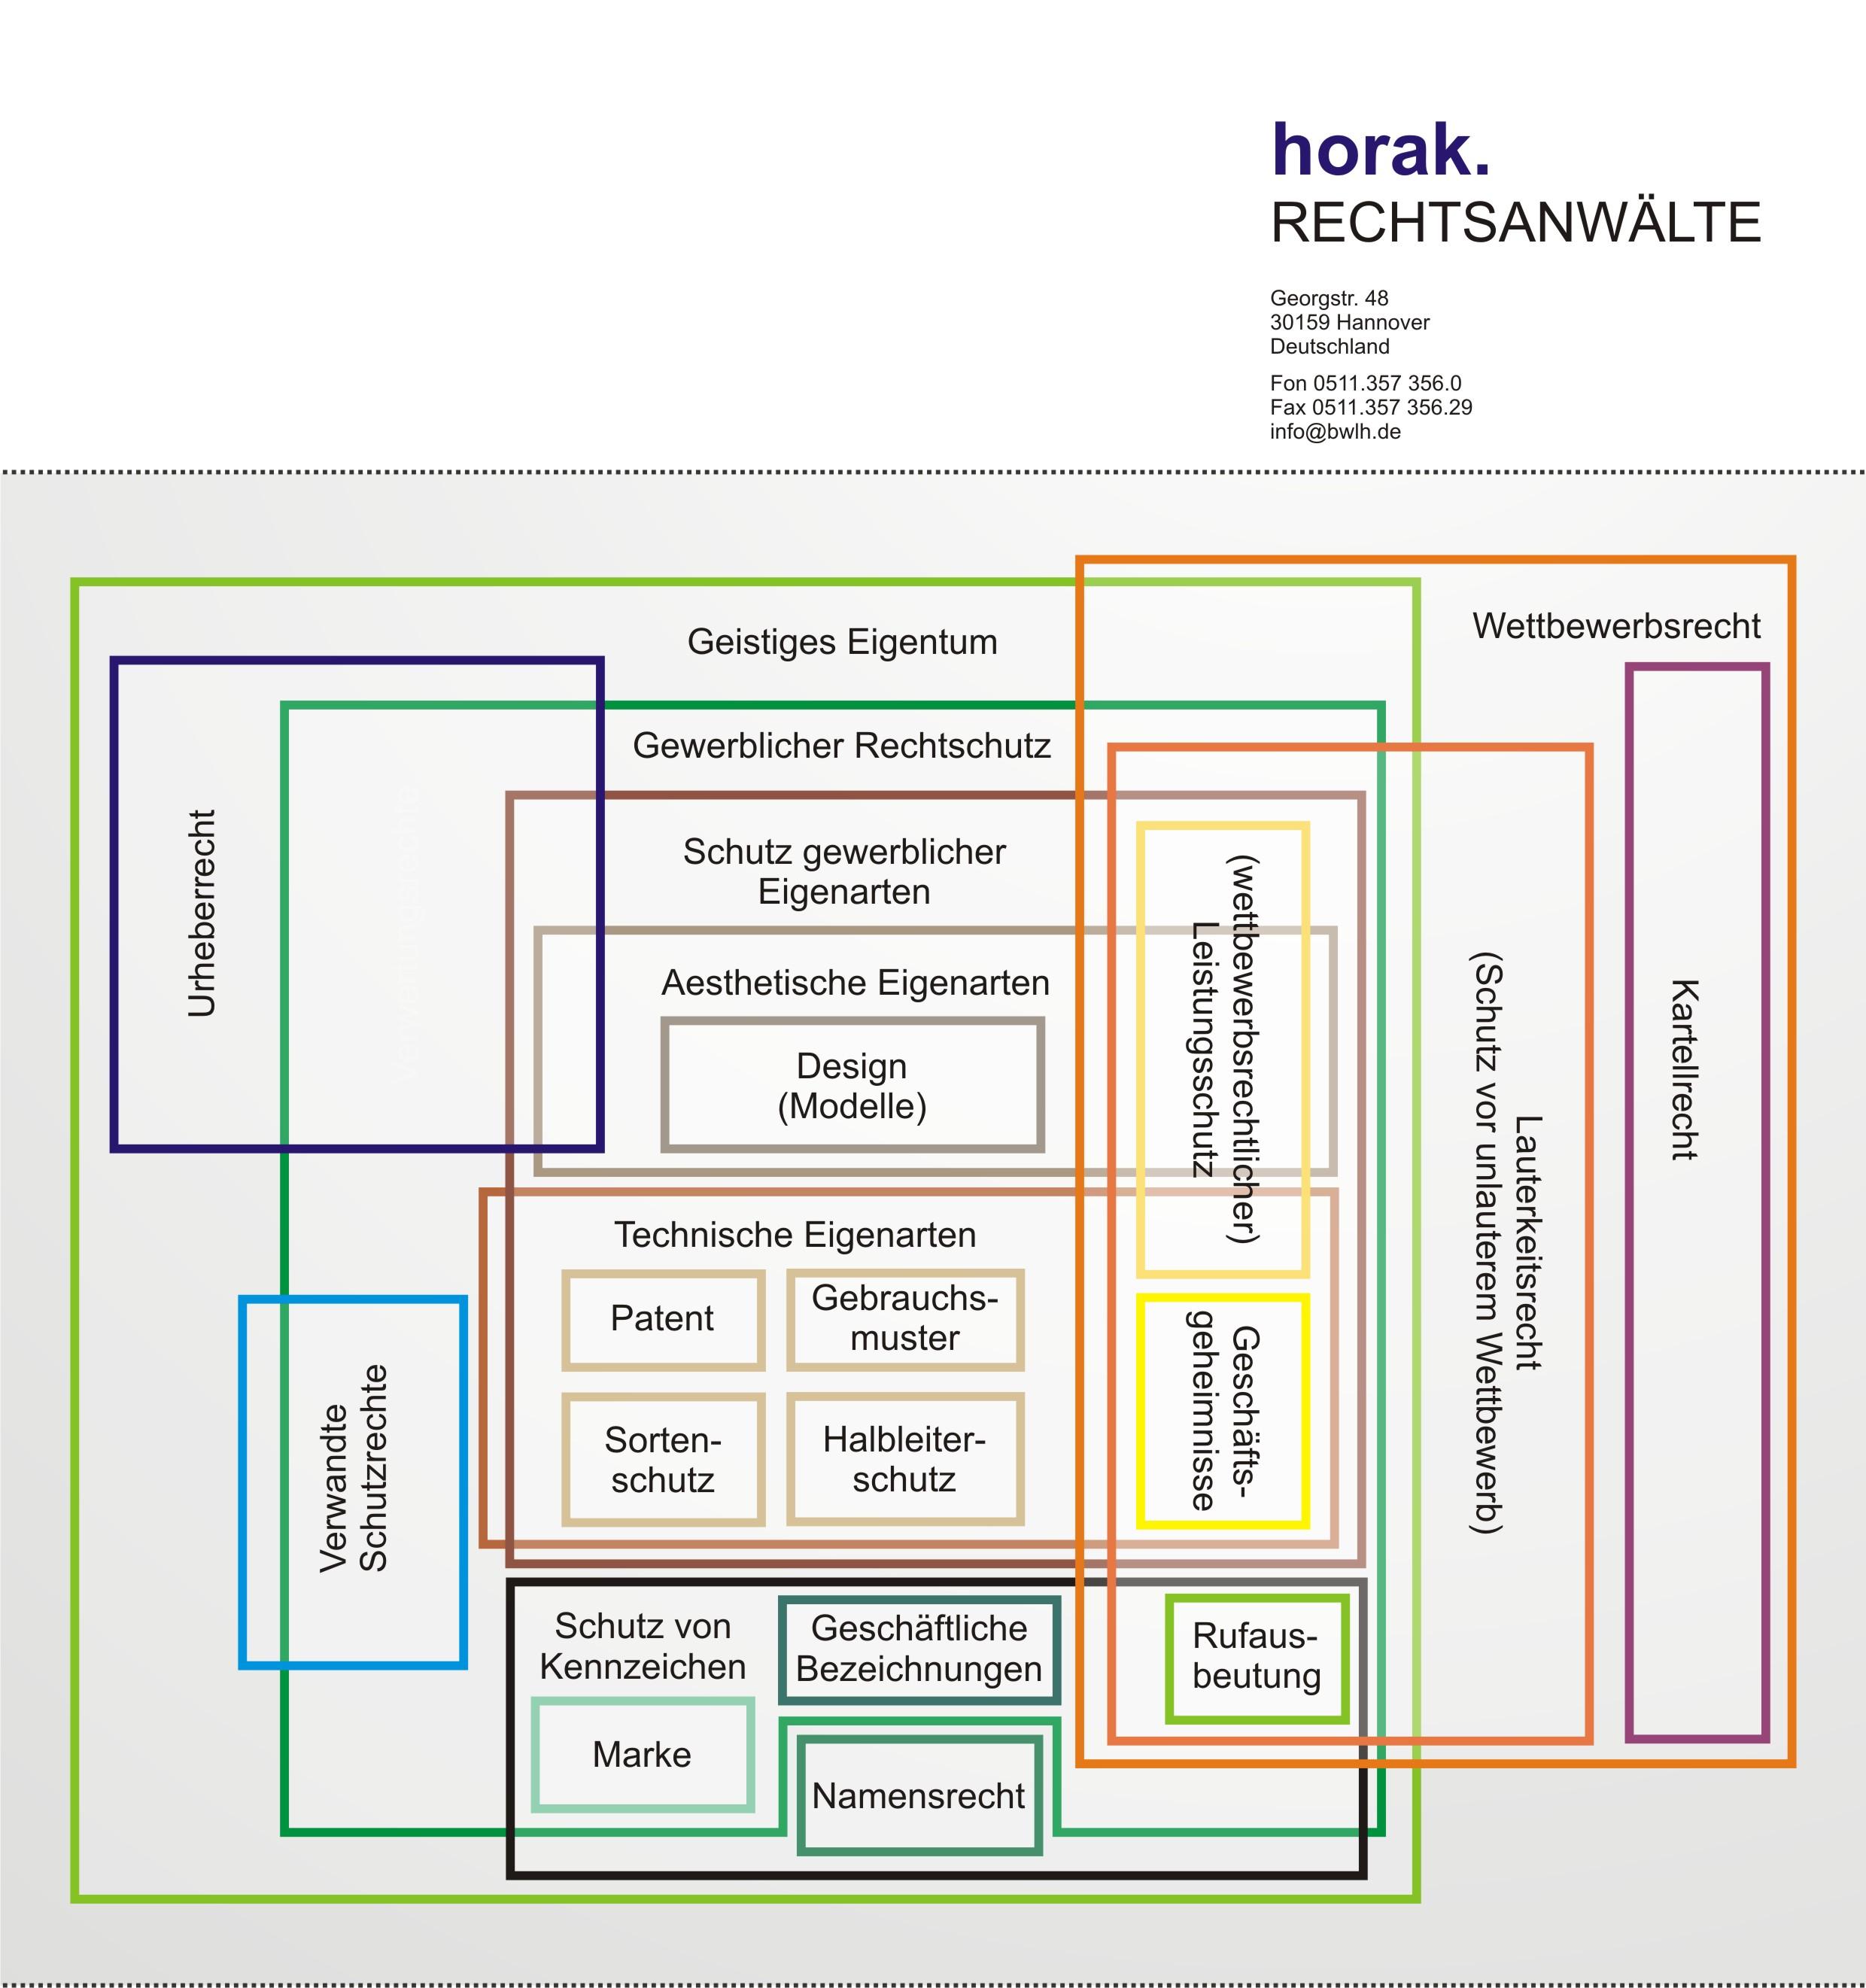 Horak Rechtsanwälte Hannover Fachanwalt Patentanwalt Rechtsberatung